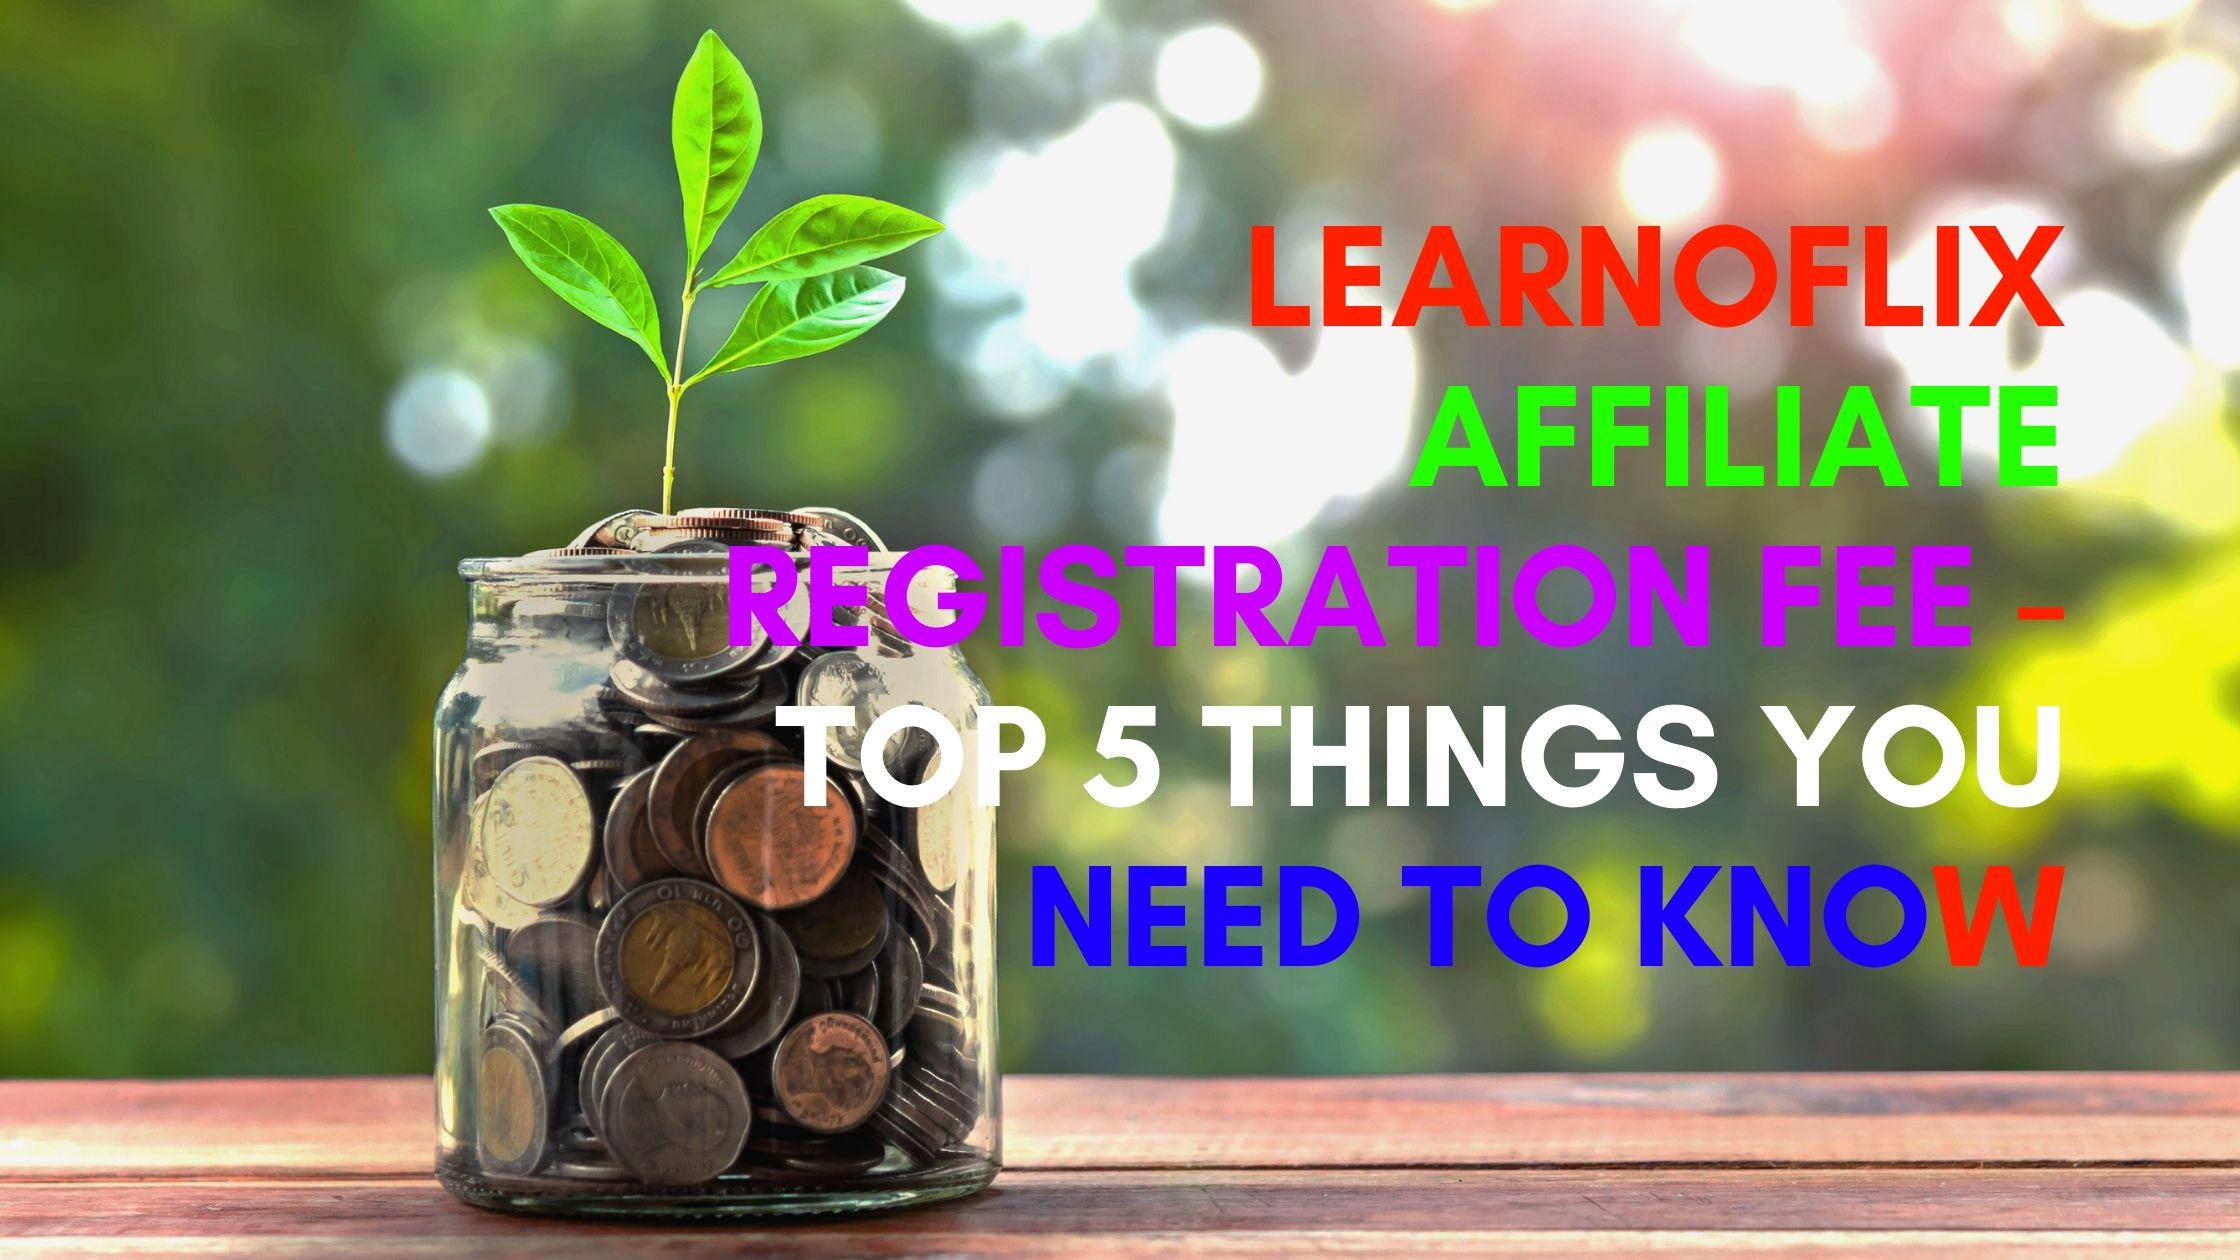 Learnoflix Affiliate Program Registration Fee